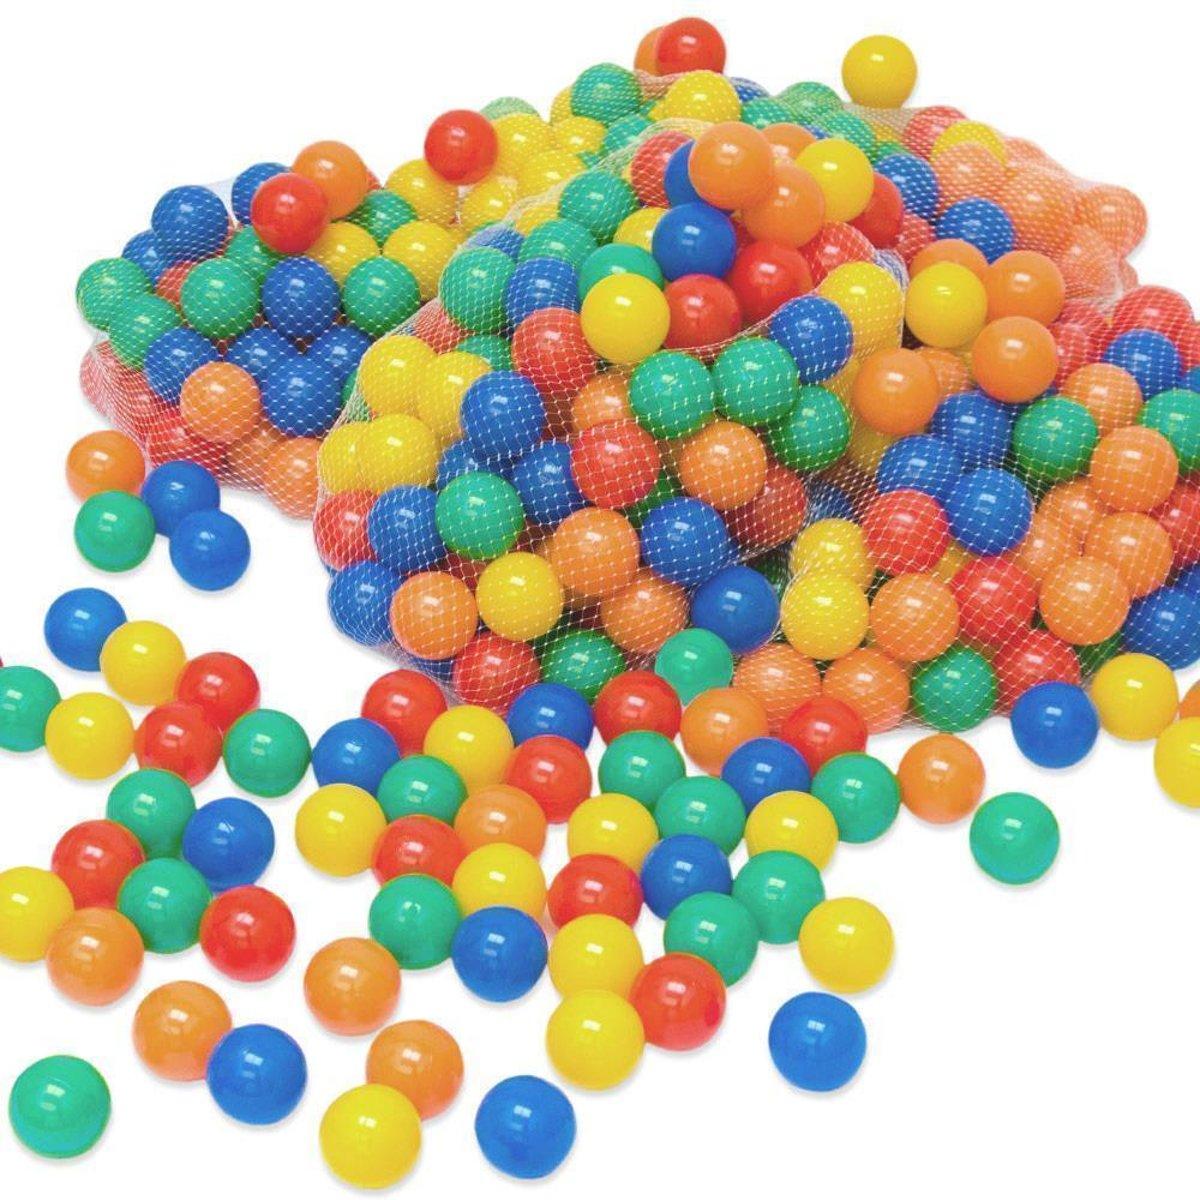 Kogelbad ballen 6 cm diameter 800 ballen